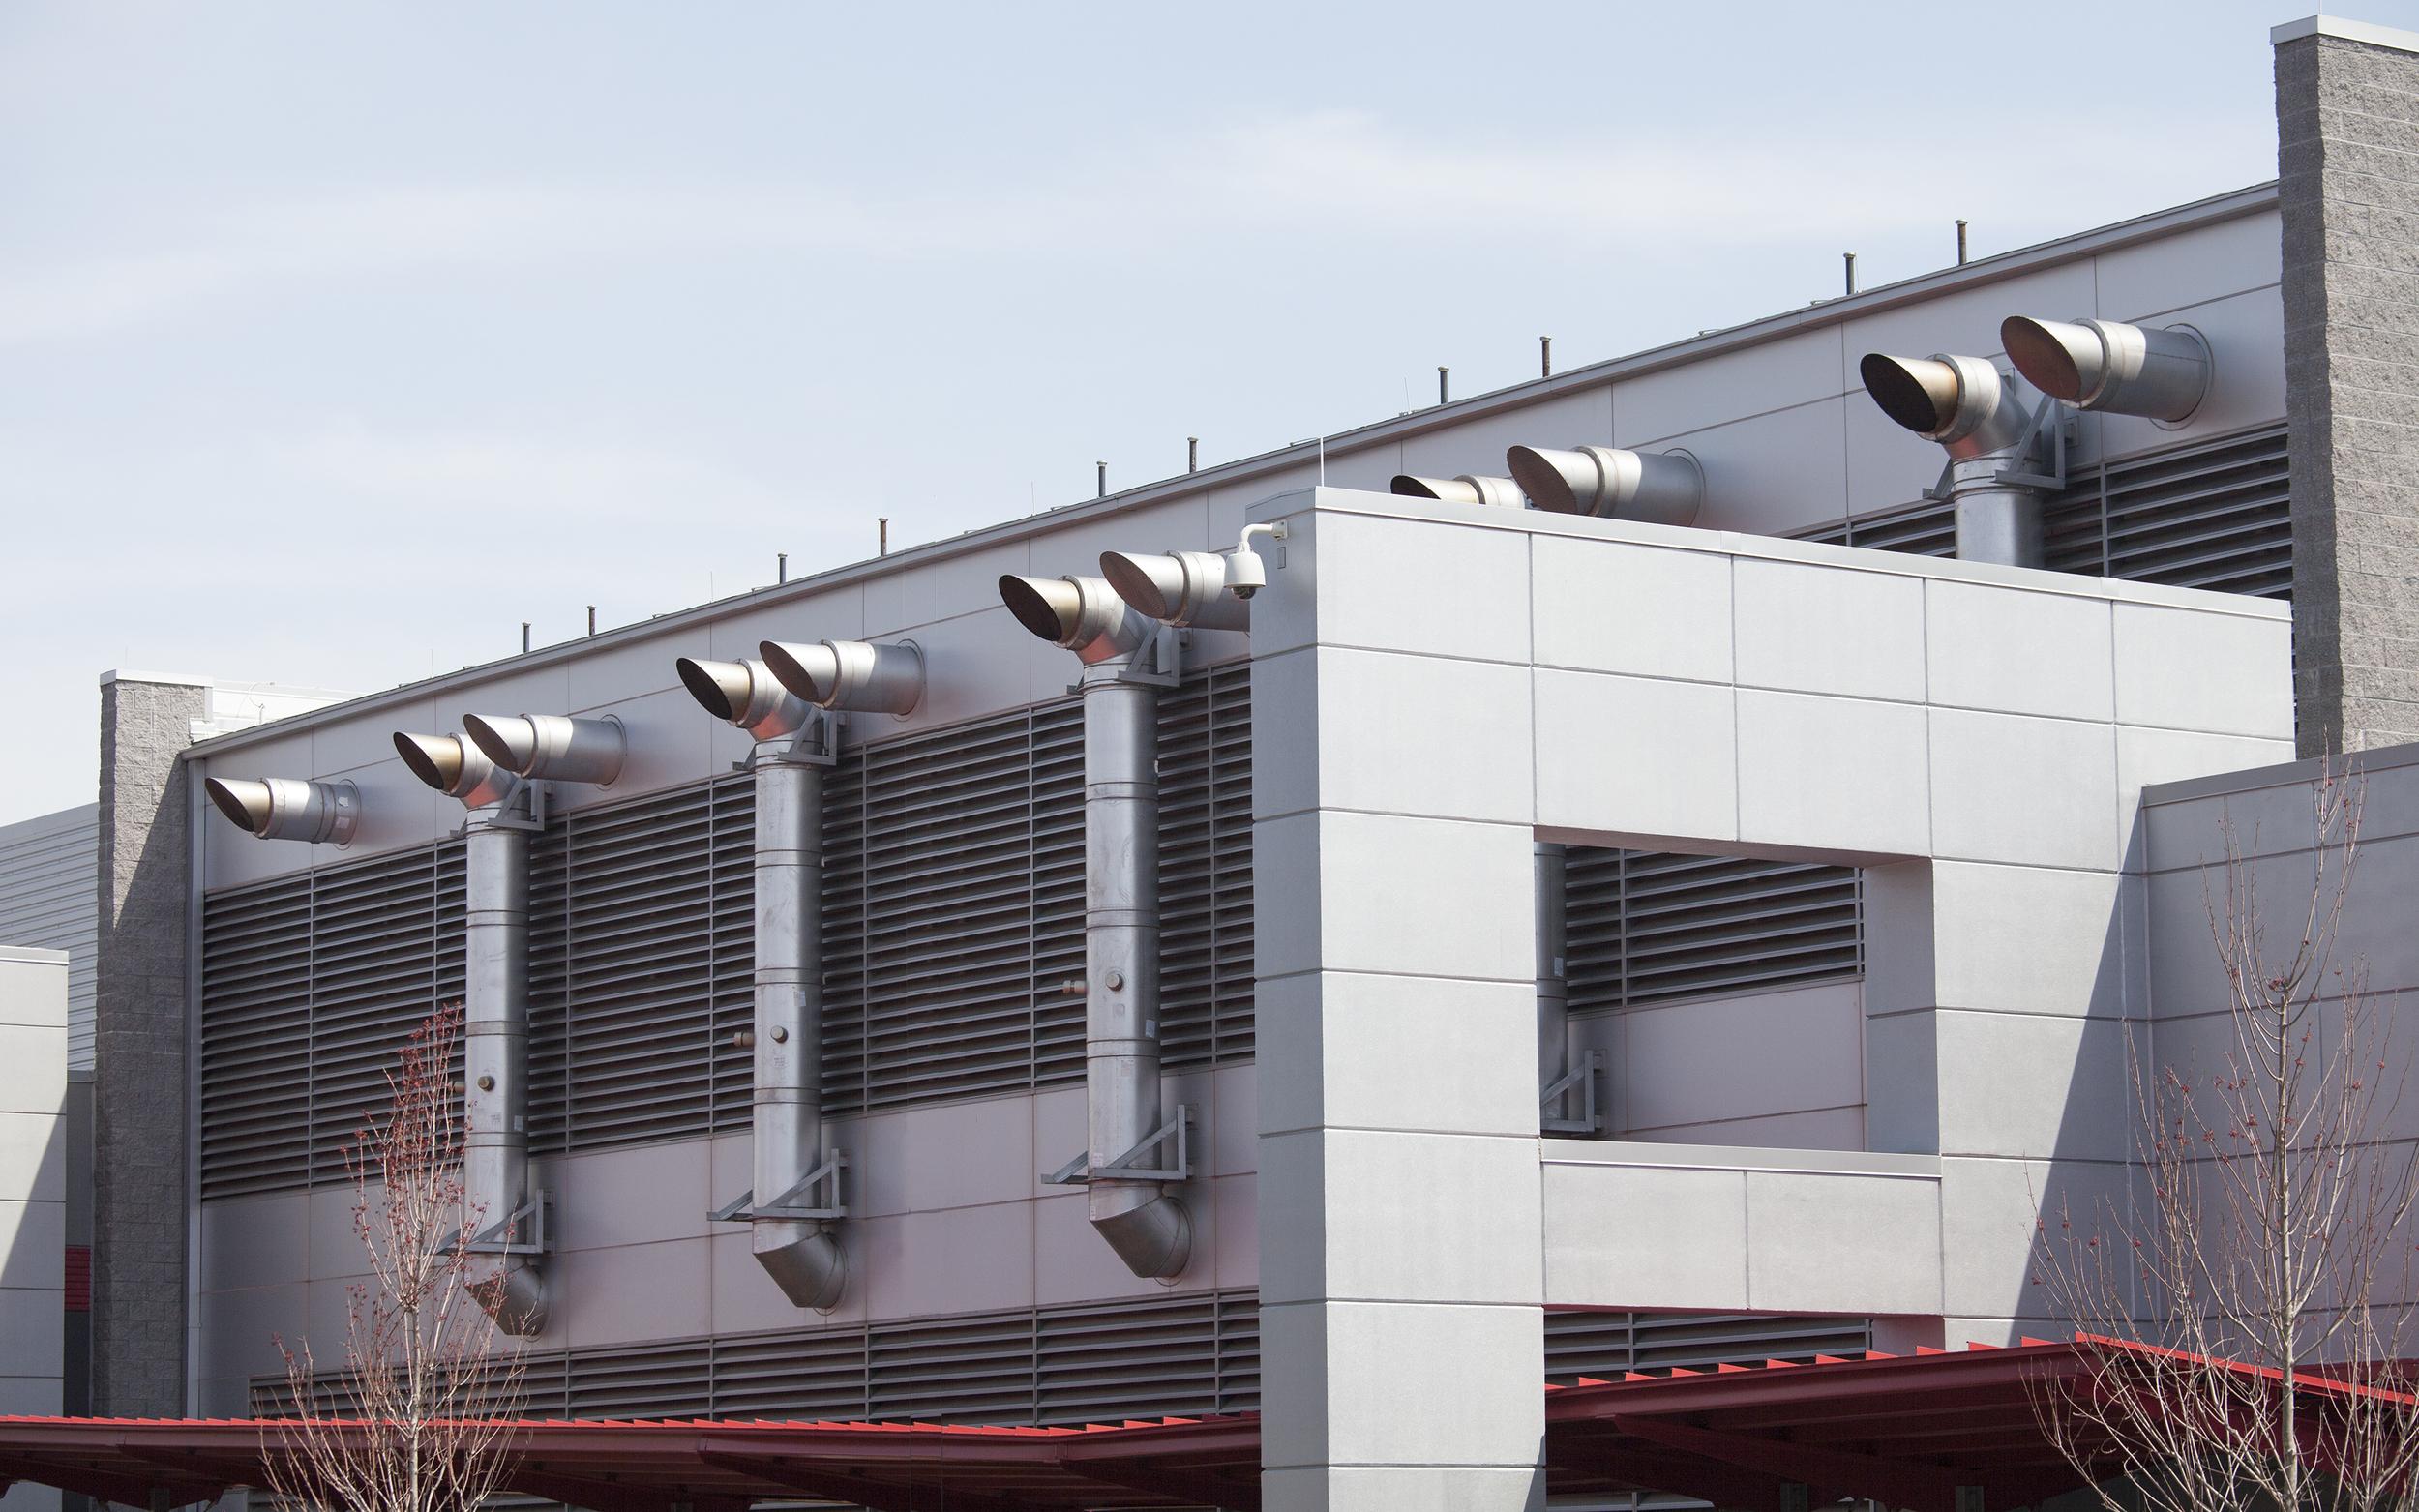 06 NAP Generator Building 3.jpg